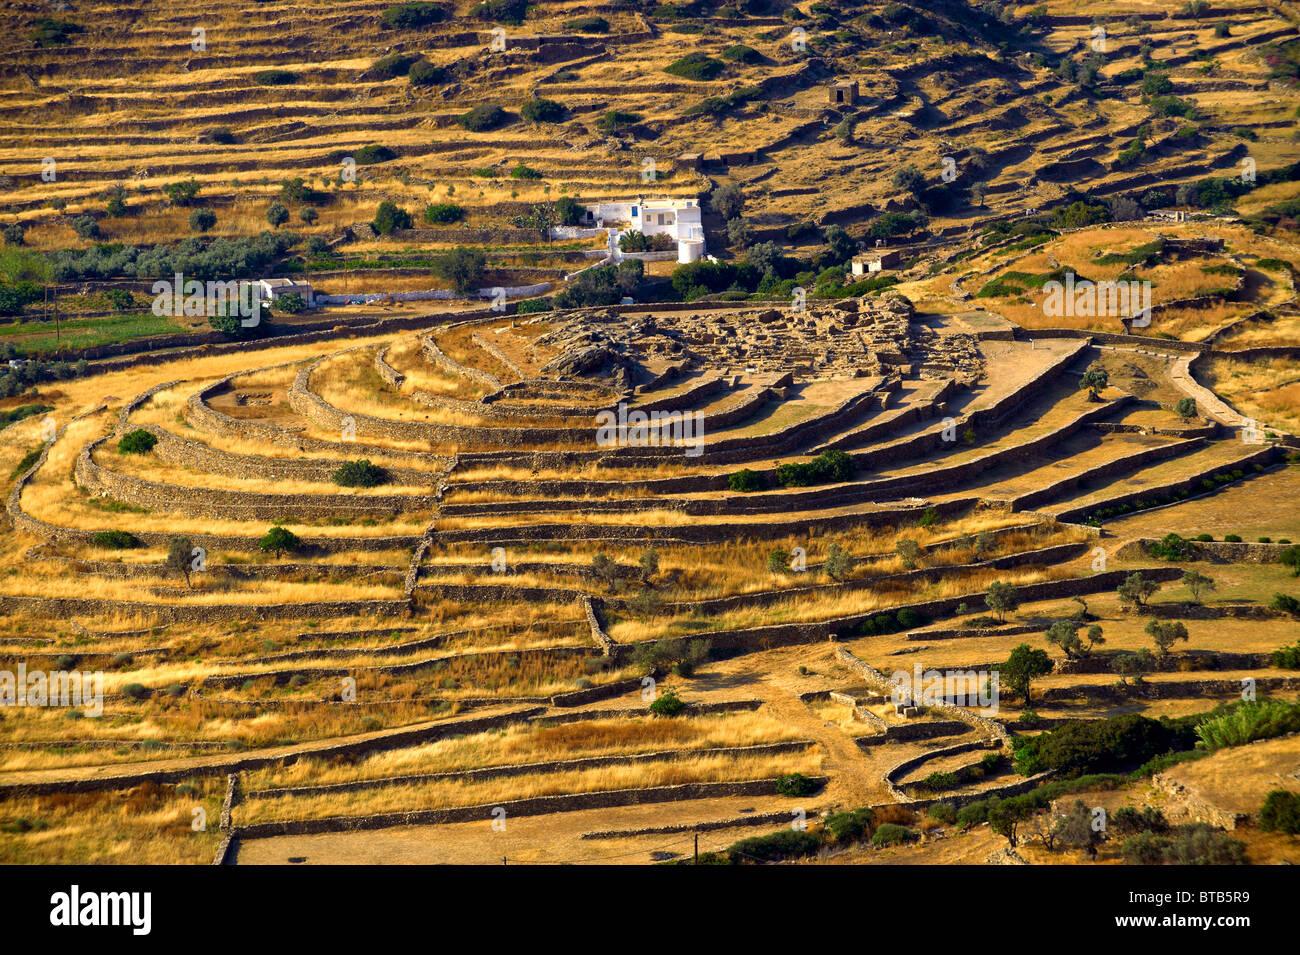 Skarkos hill prehistoric settlement ruins. European Union Cultural Heritage archaeological site of Skarkos - Stock Image